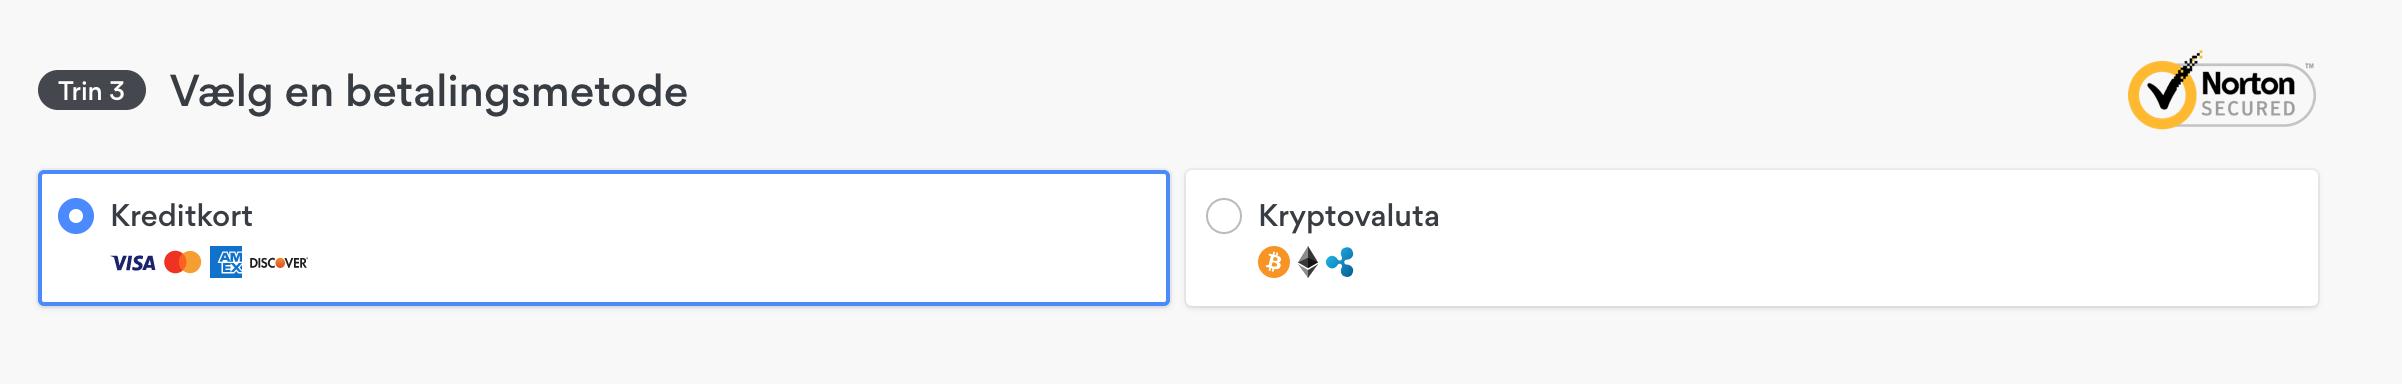 Screenshot of payment options for NordVPN's hidden deals